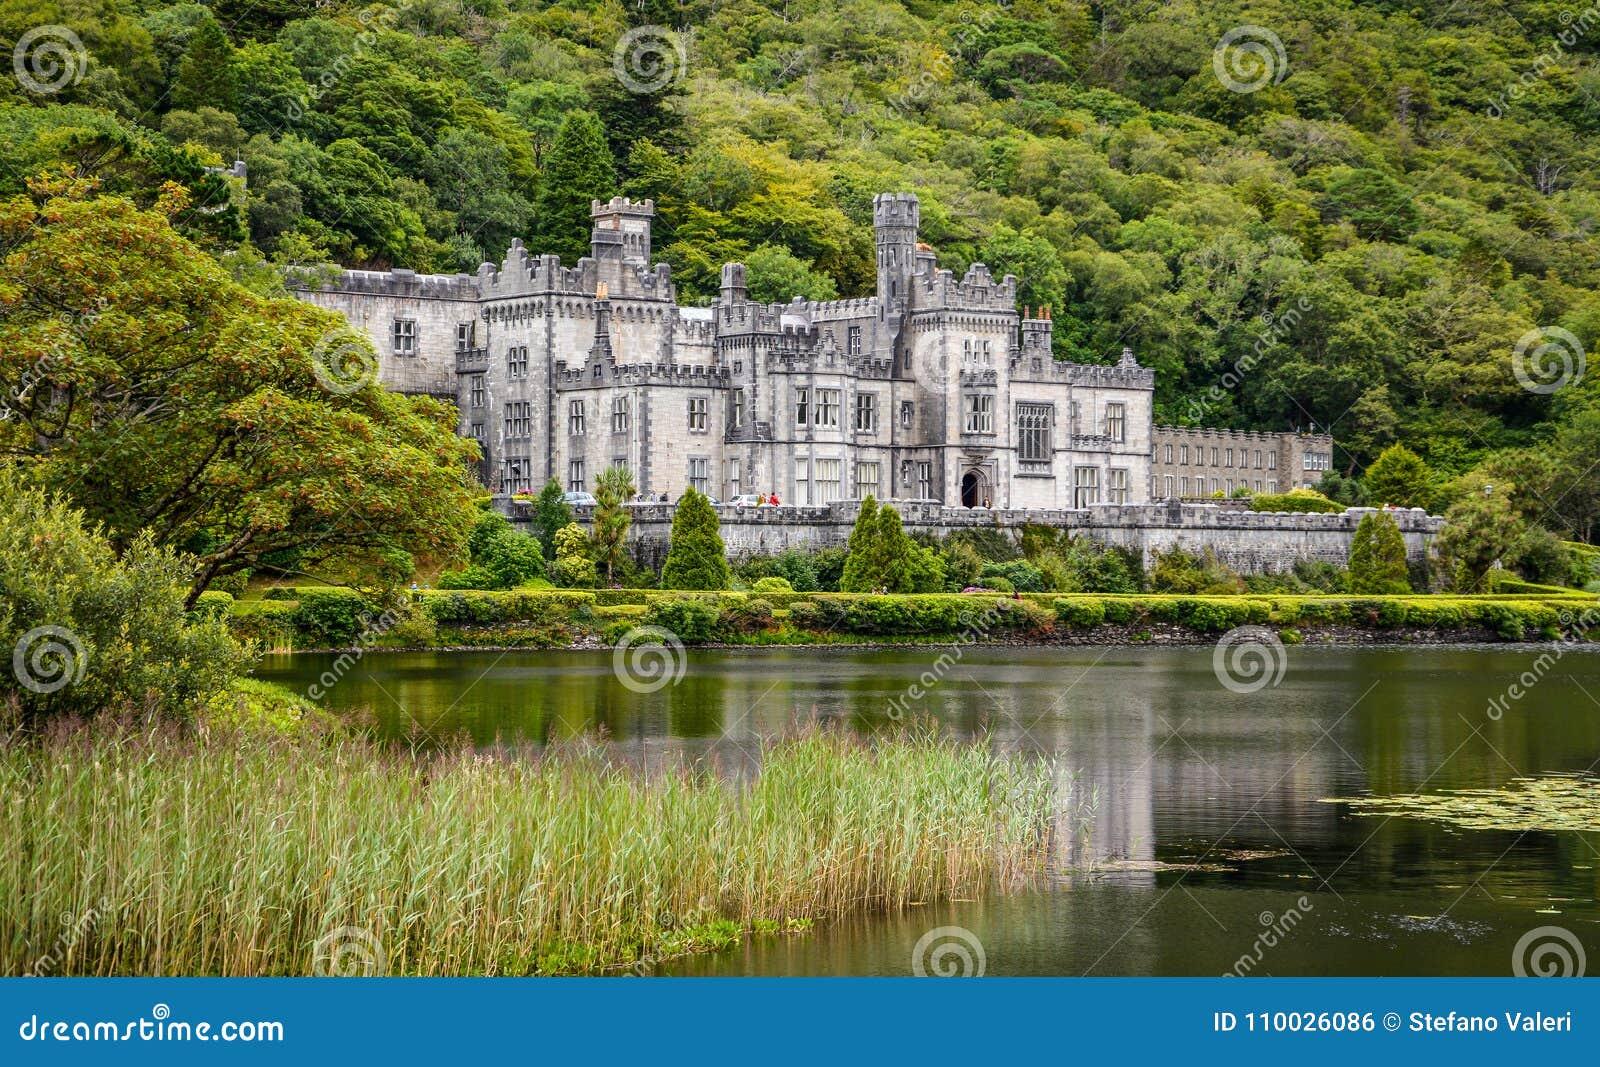 Kylemoreabdij, in Connemara, Provincie Galway, Ierland